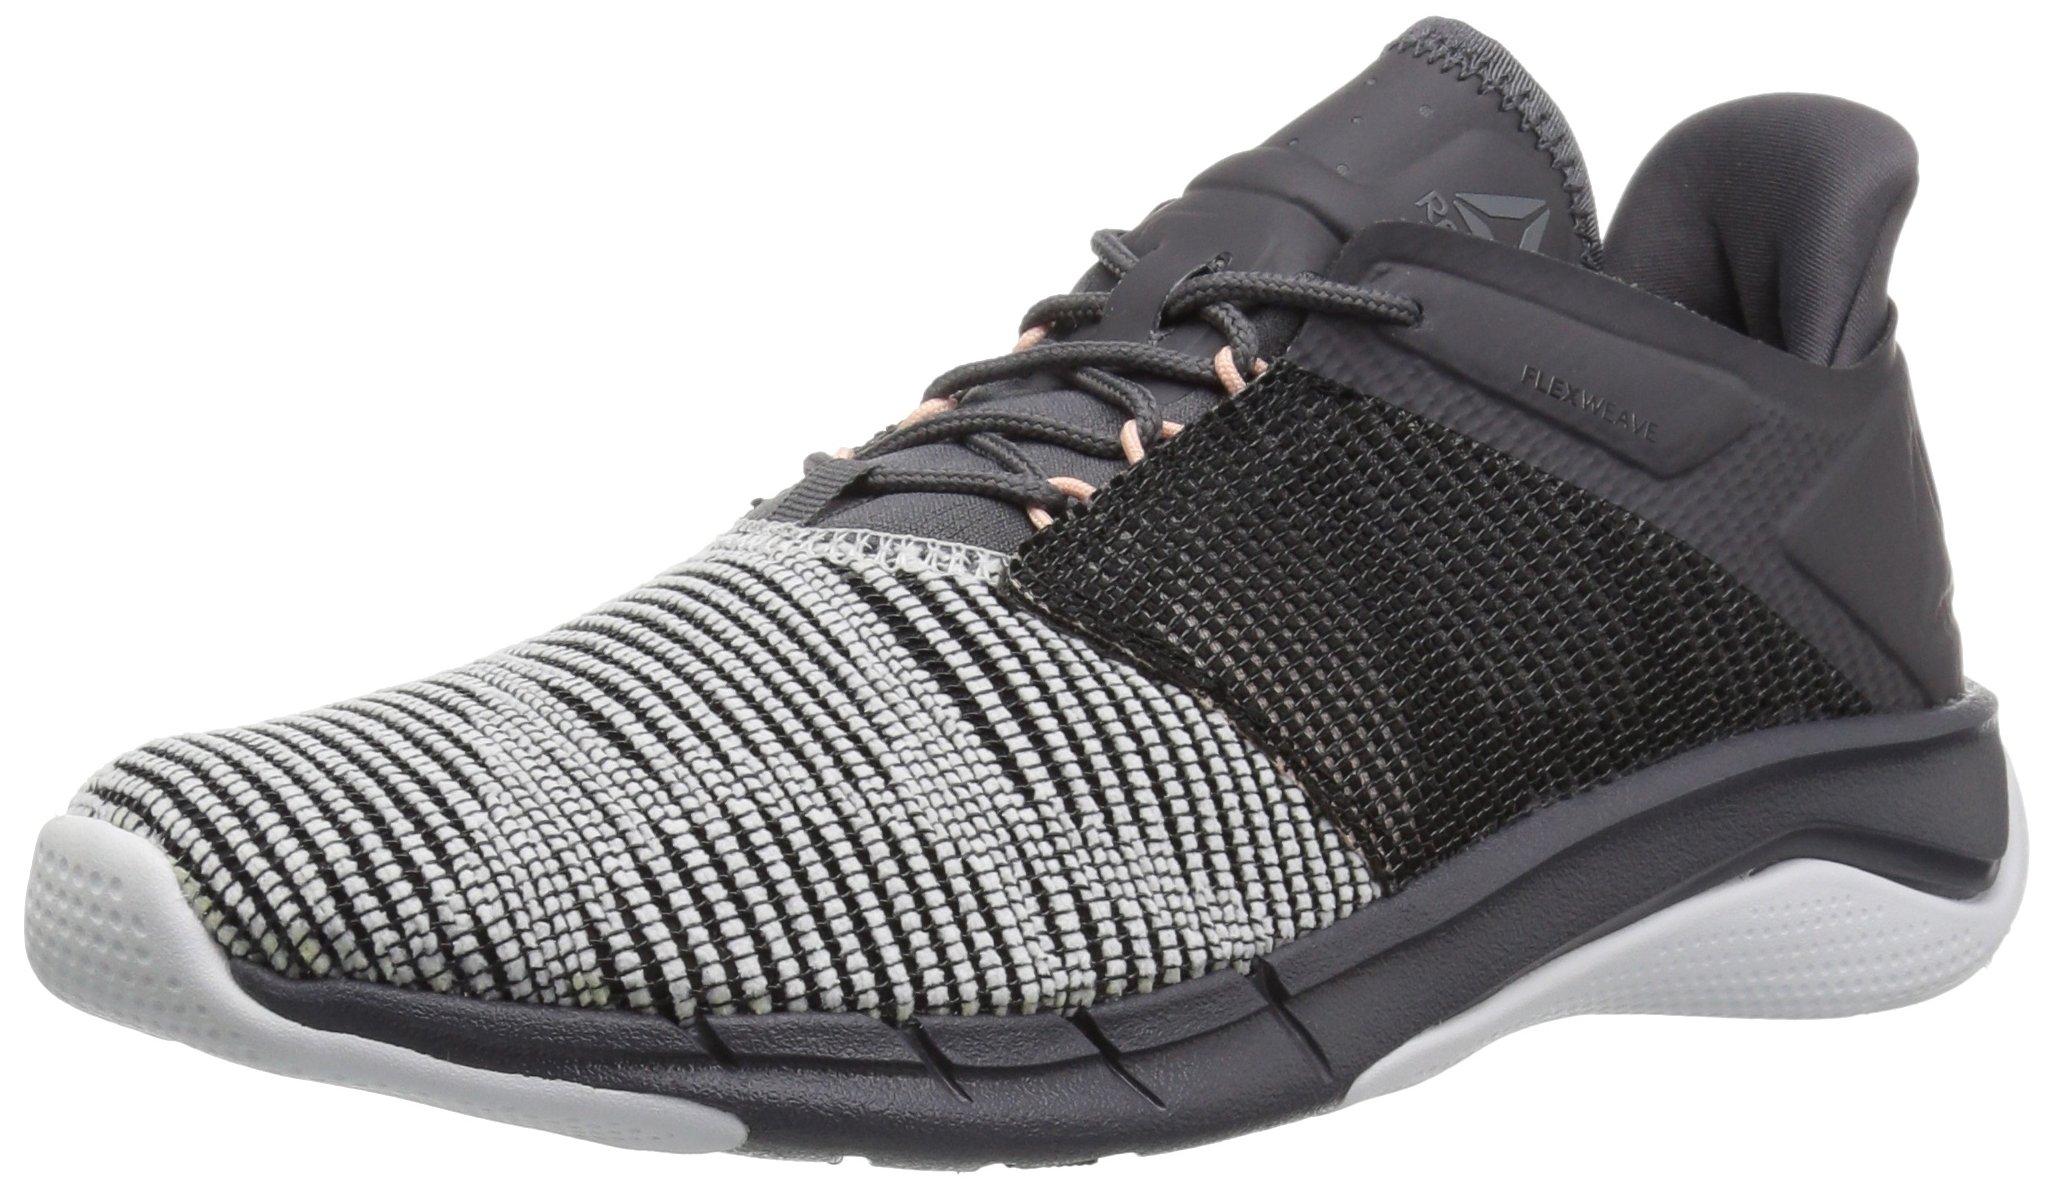 Reebok Women's Fast Flexweave Running Shoe, White/Ash Grey/Black/Desert Dust, 7 M US